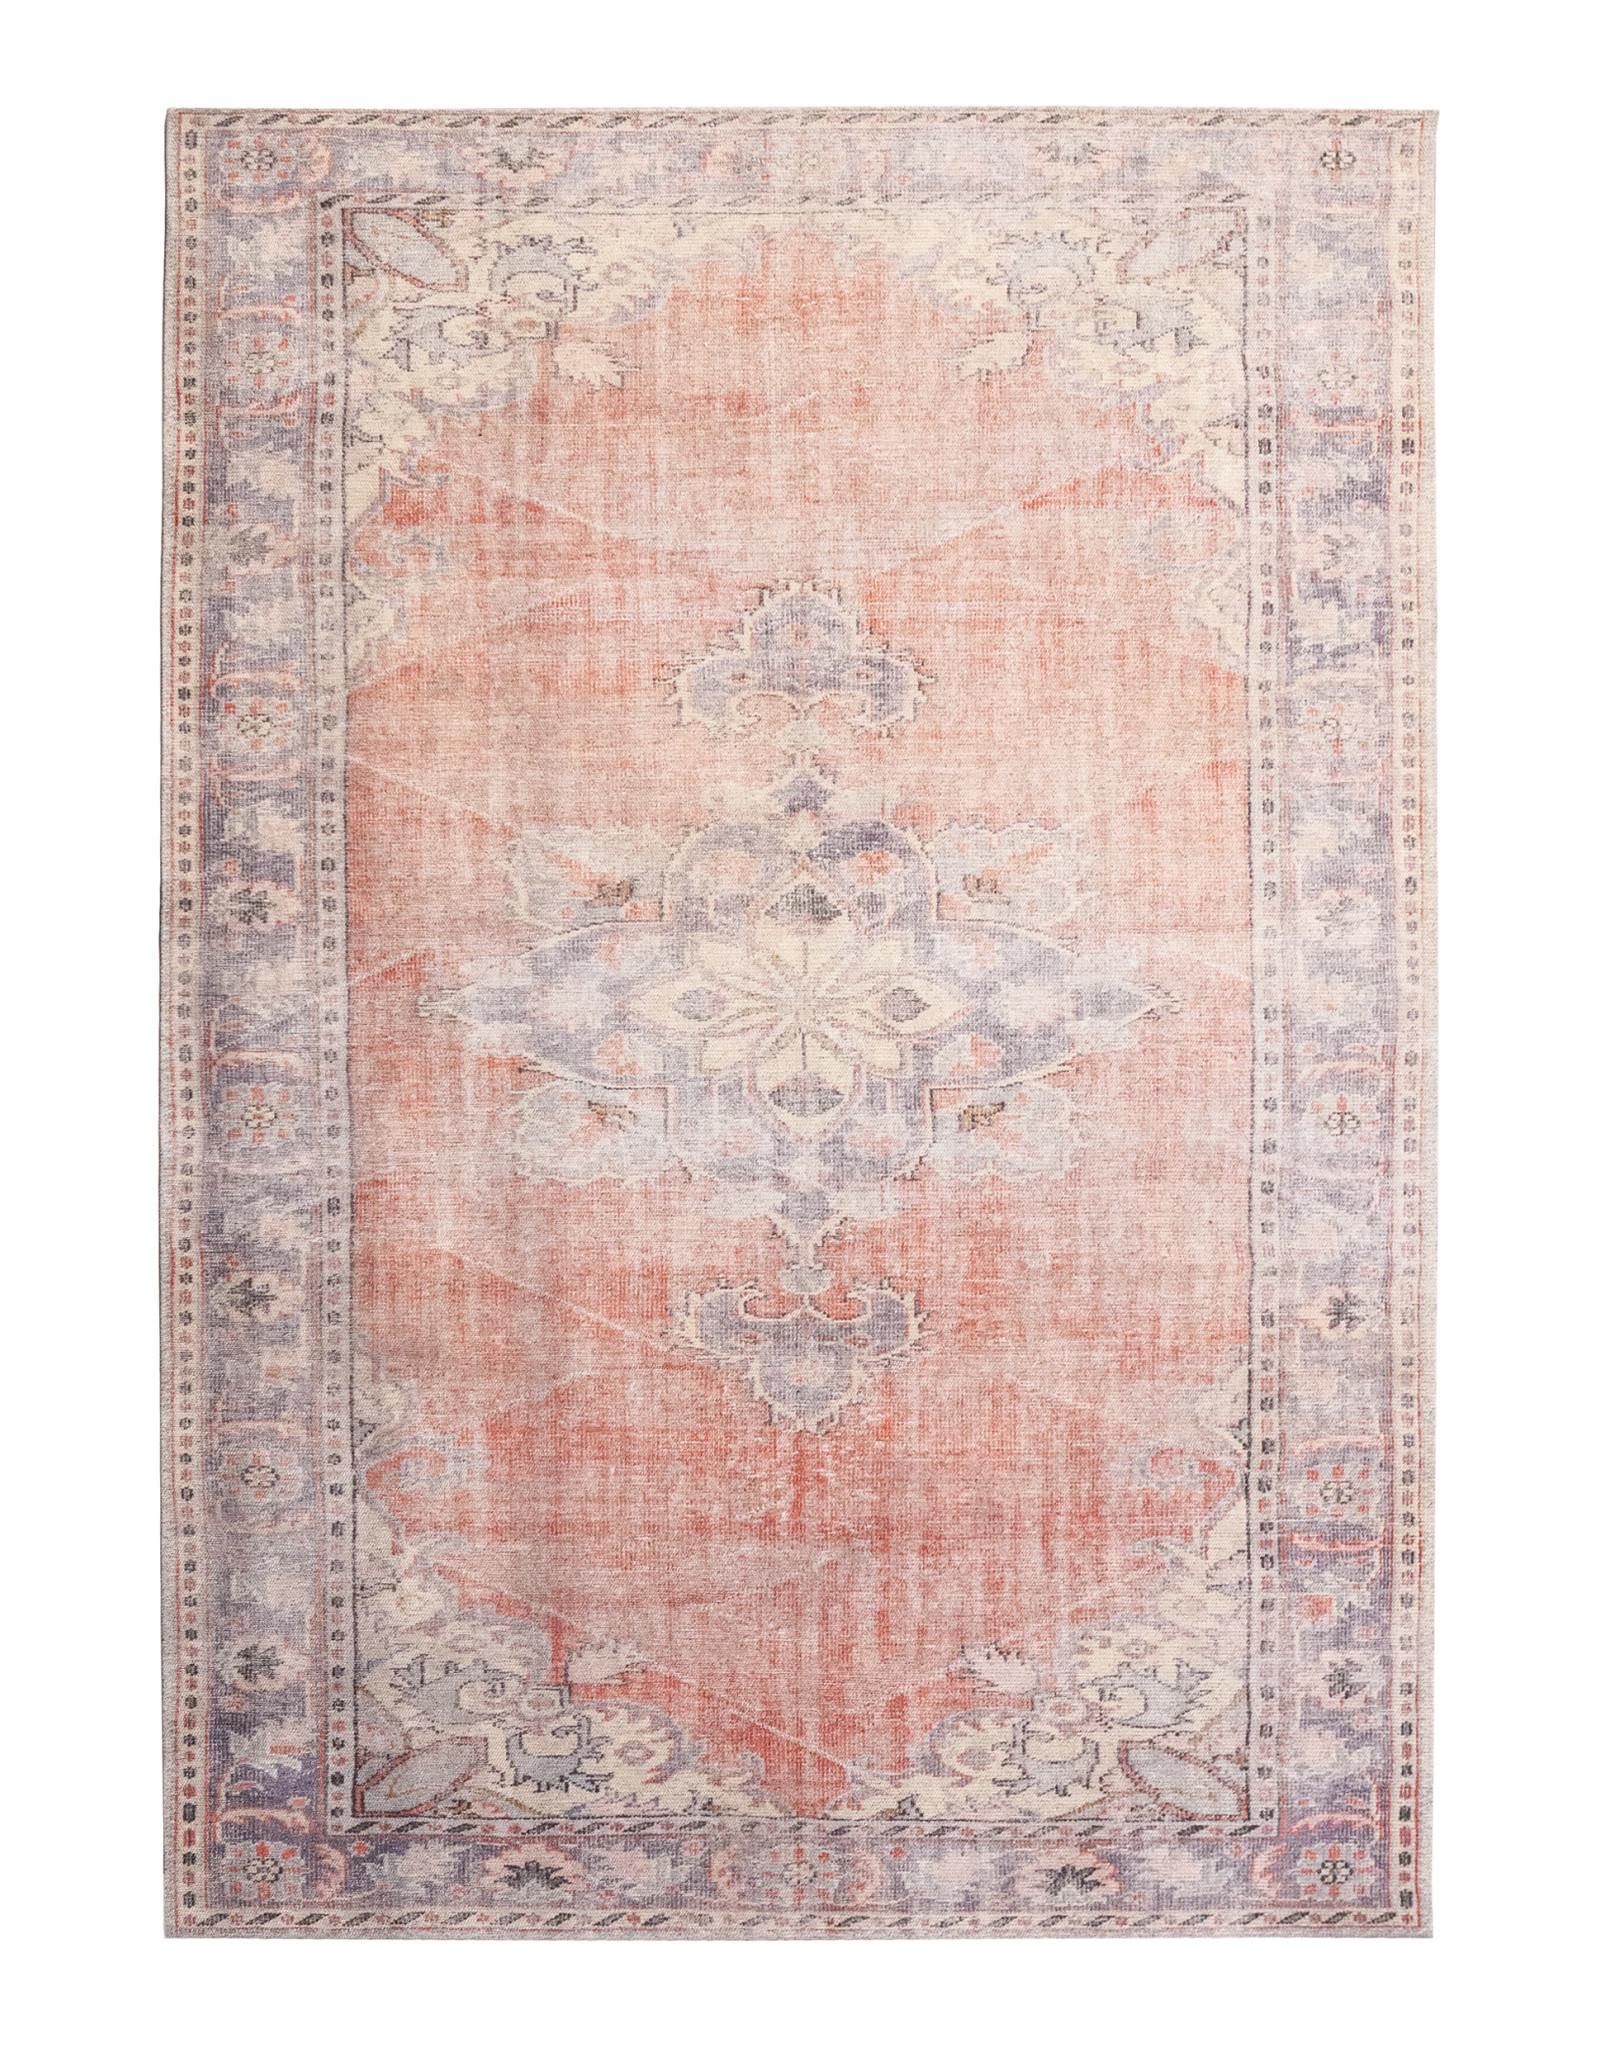 Vloerkleed Blush 200x290 cm - roze